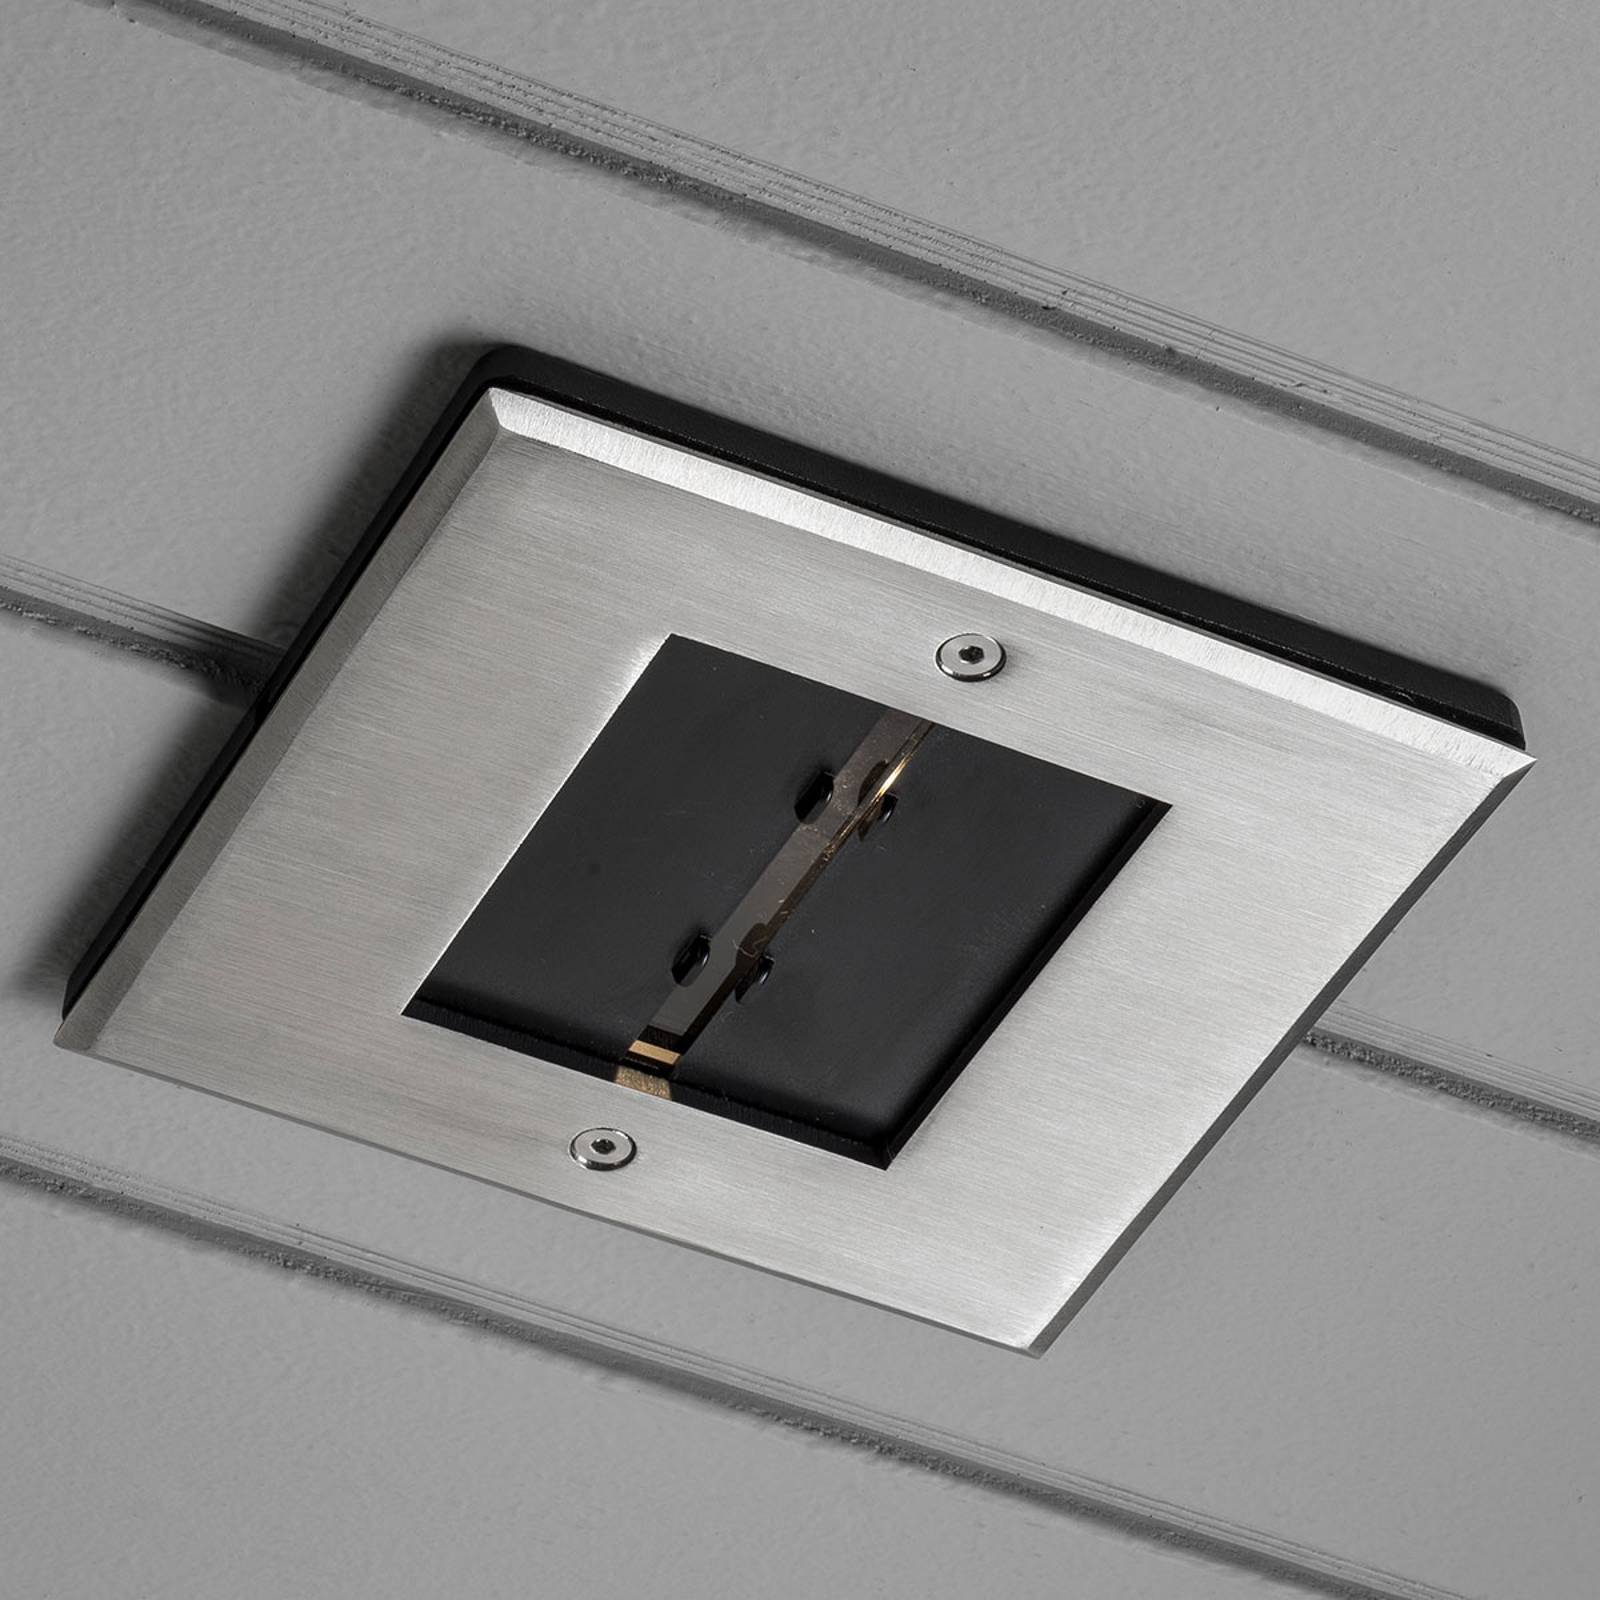 LED-takspot Recessed Spot, handmade in EU